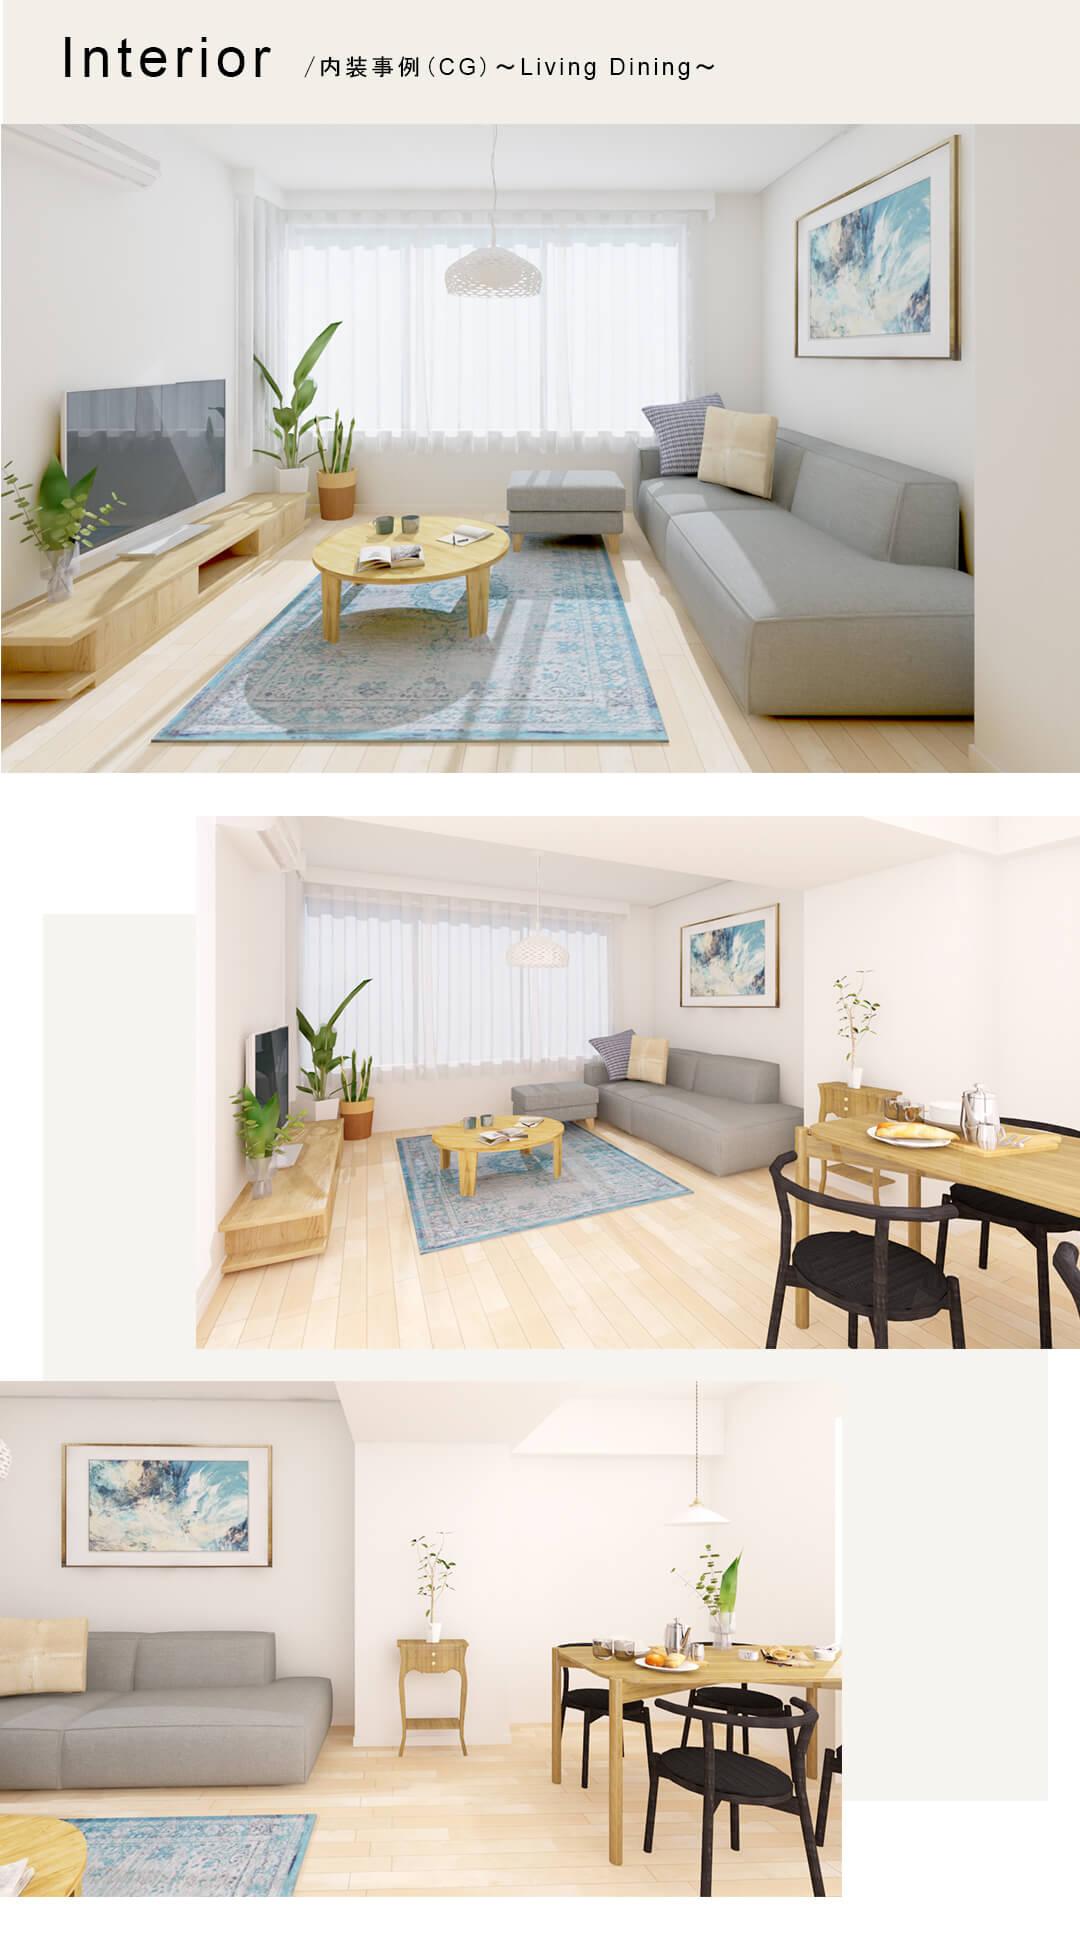 Interior,内装事例,CG,livingdining